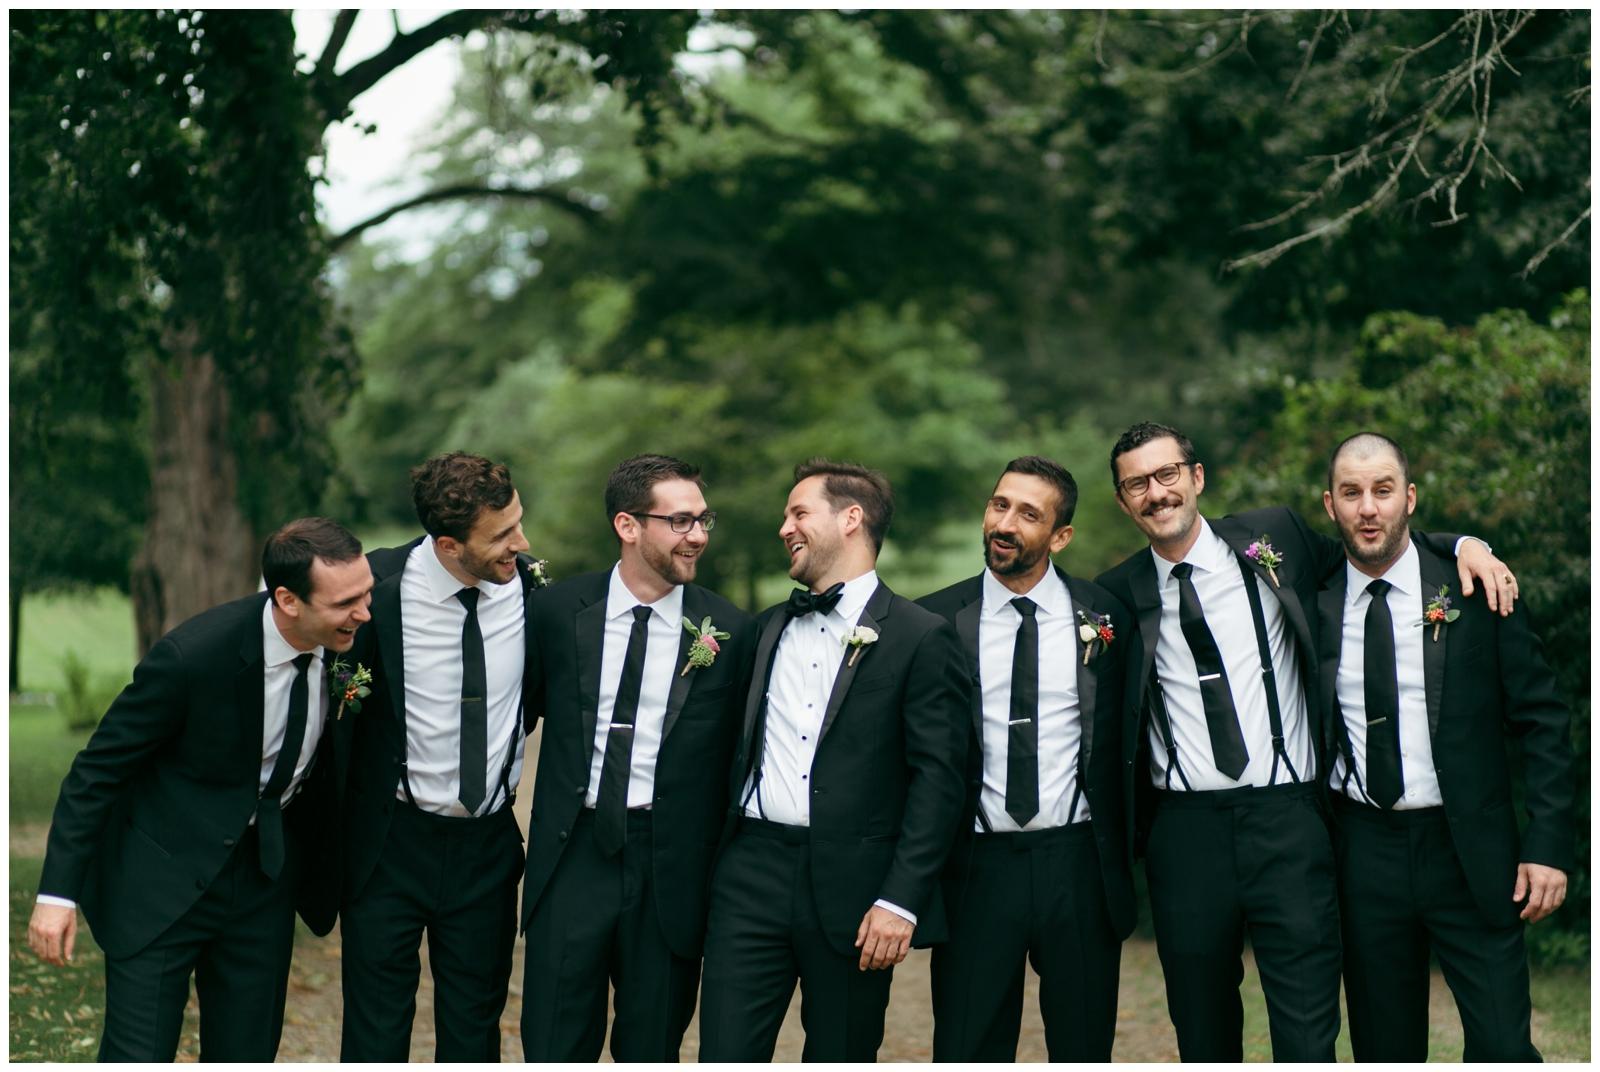 Moraine-Farm-wedding-Bailey-Q-Photo-Massachusetts-wedding-photpgrapher-038.jpg